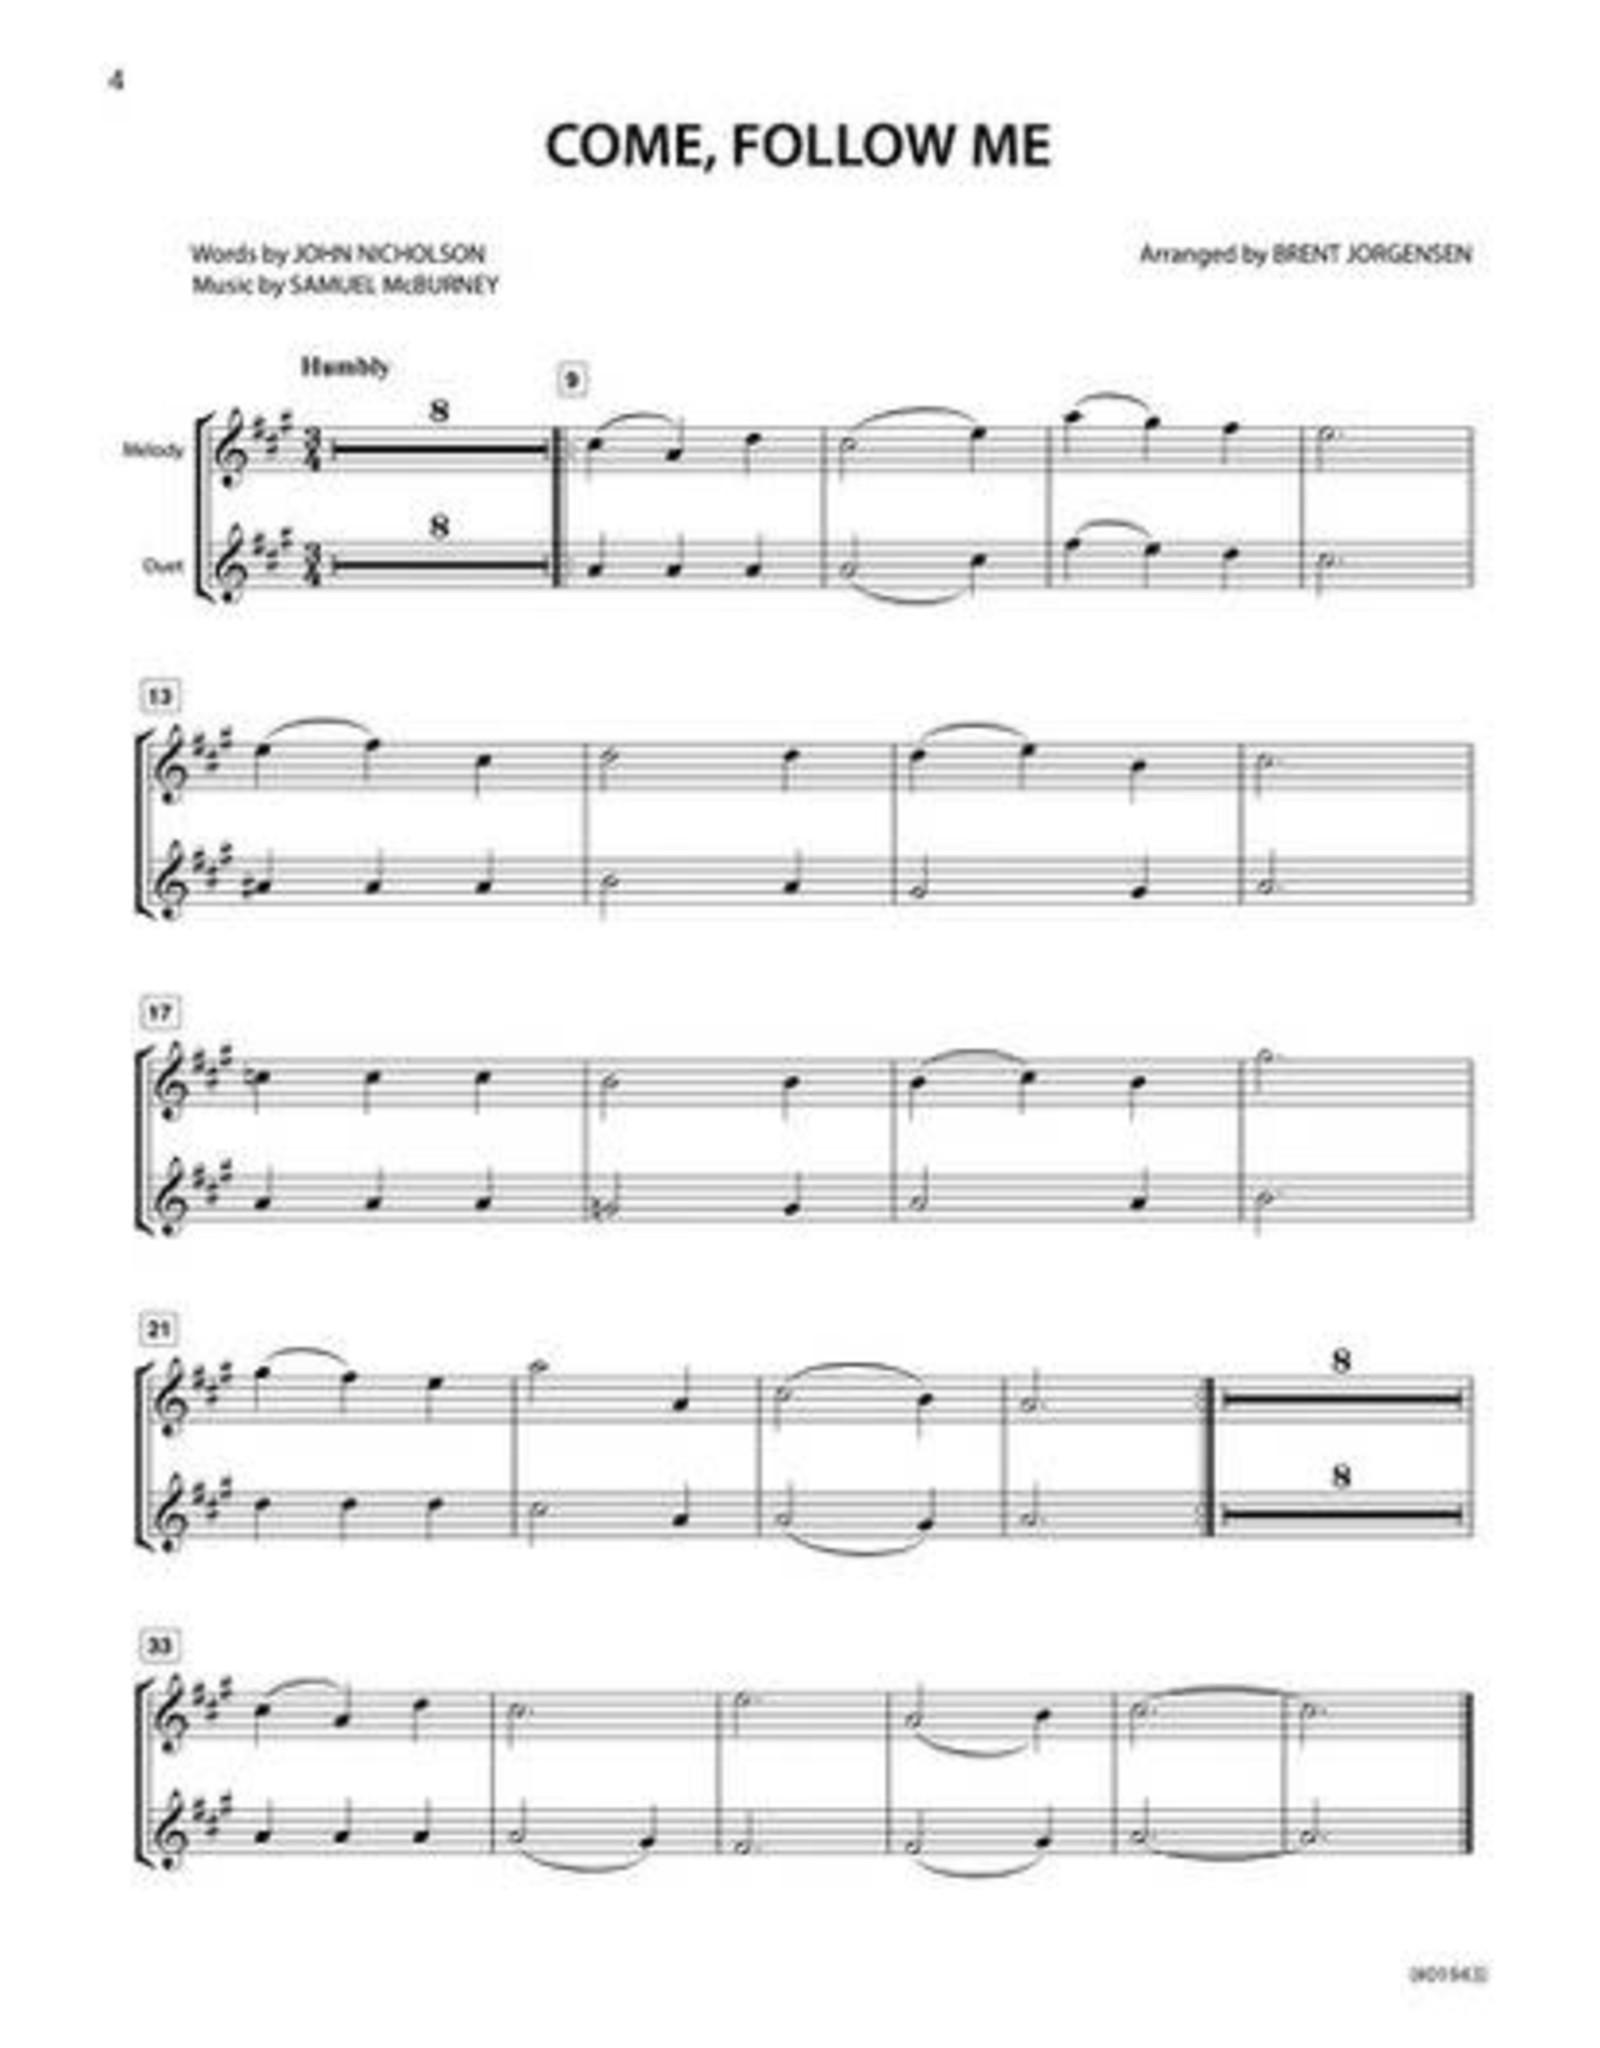 Jackman Music Hymn-Alongs Vol. 1 - arr. Brent Jorgensen - Alto Saxophone